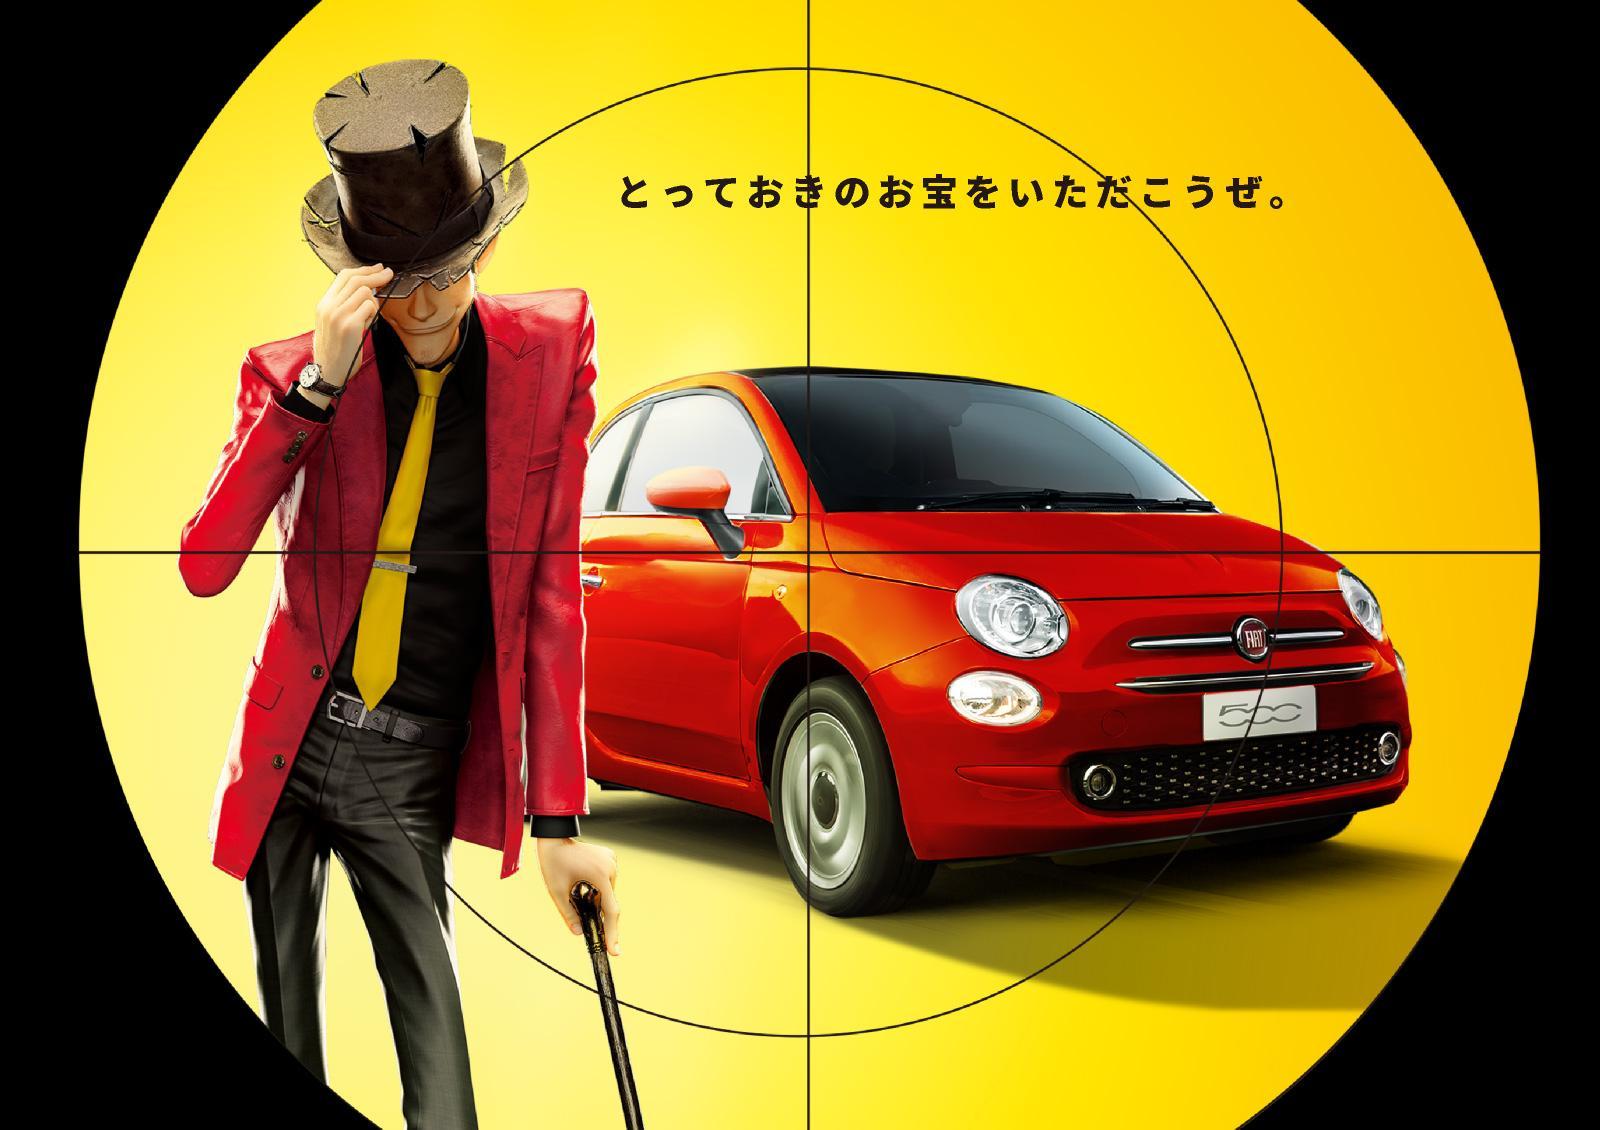 FIAT広島 ご成約プレゼントキャンペーン(11/22~12/27)